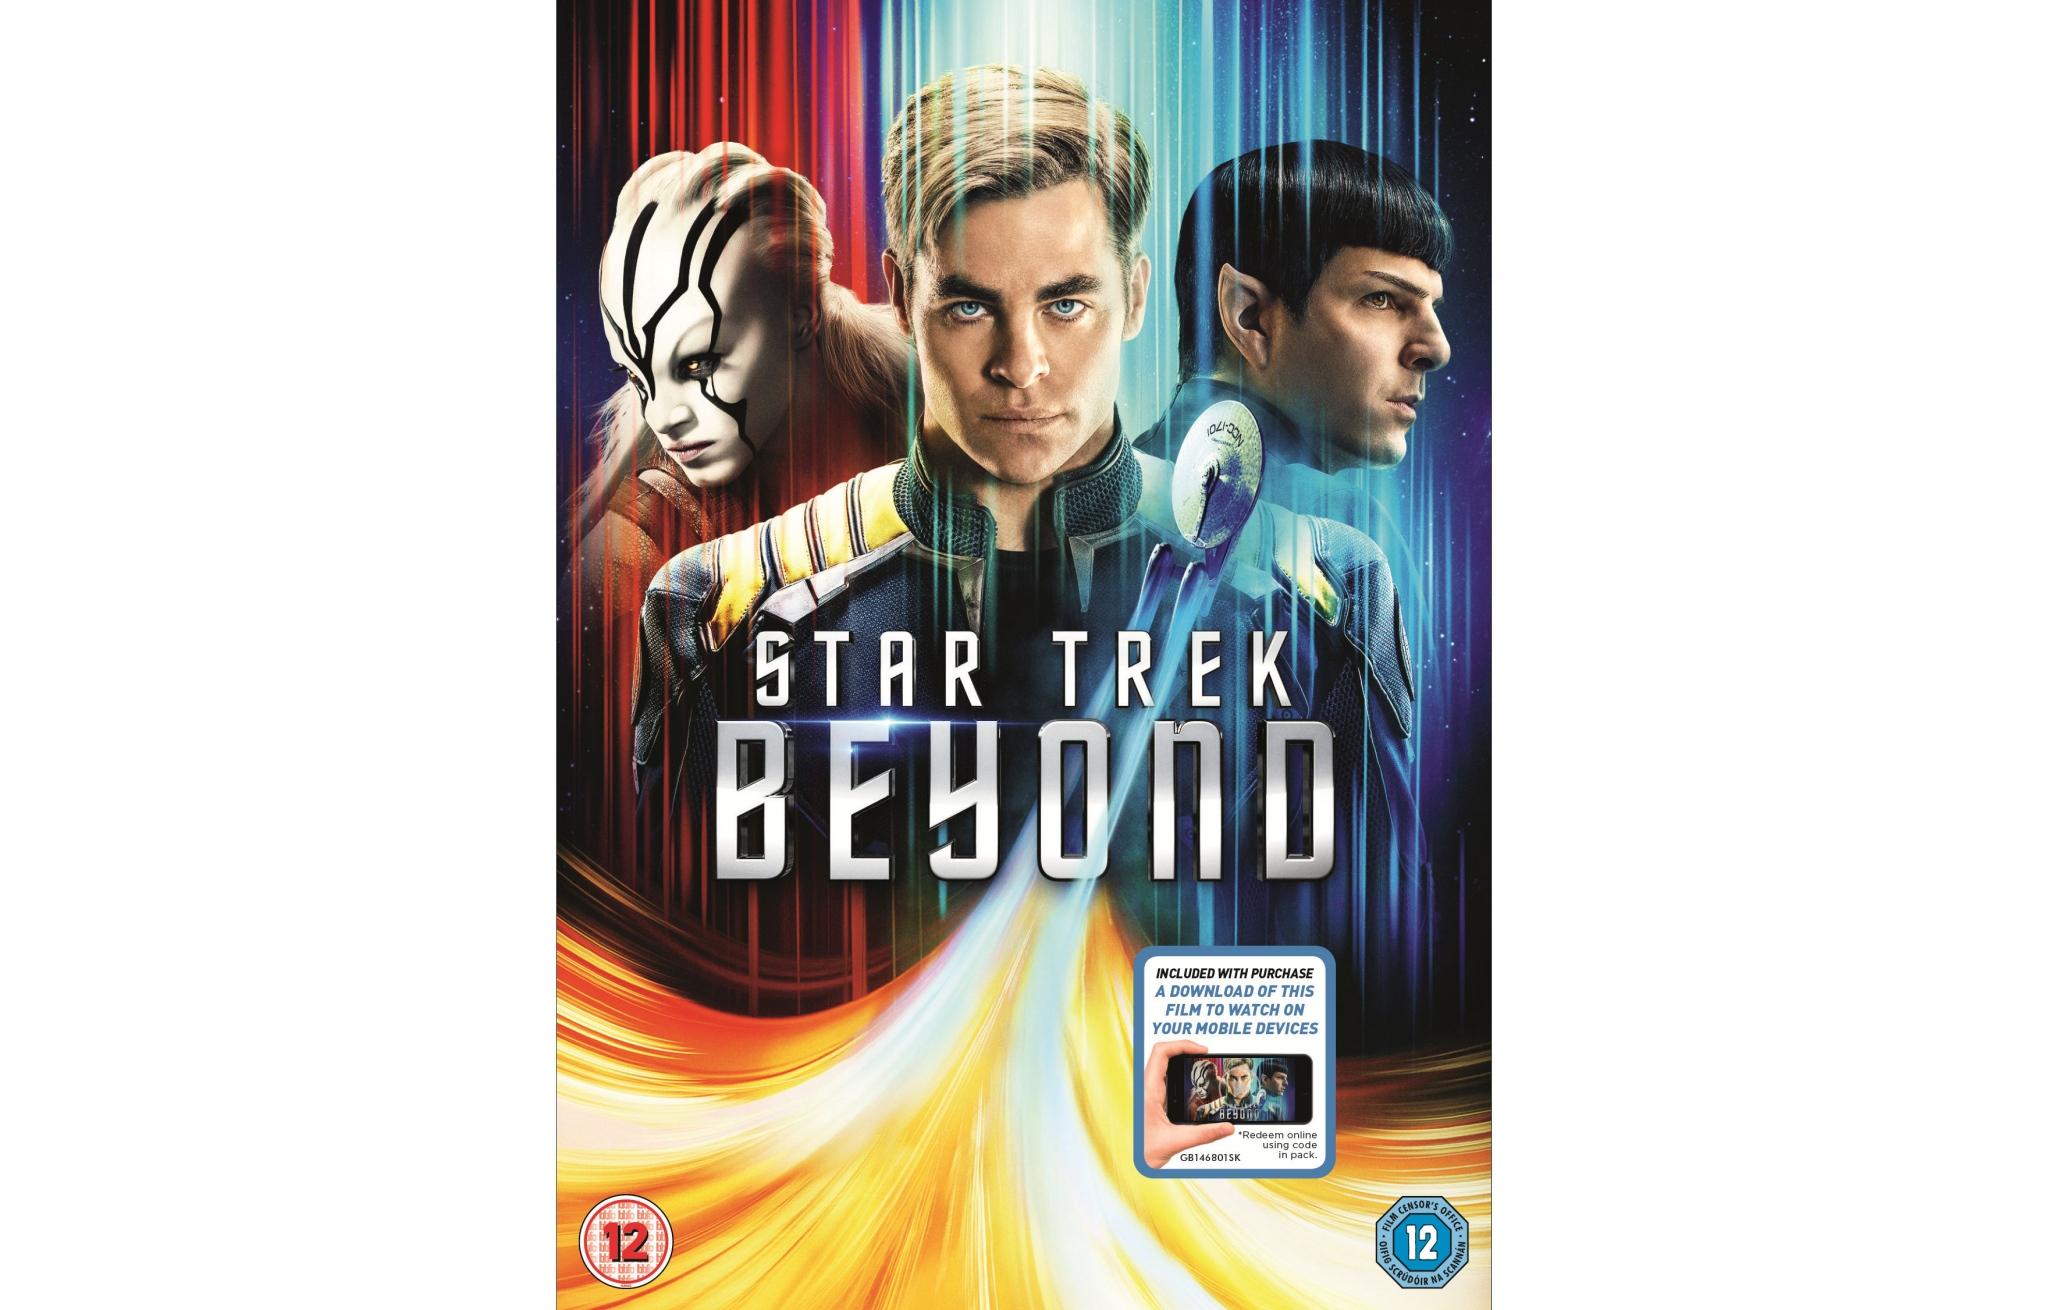 Star trek movie blu ray release